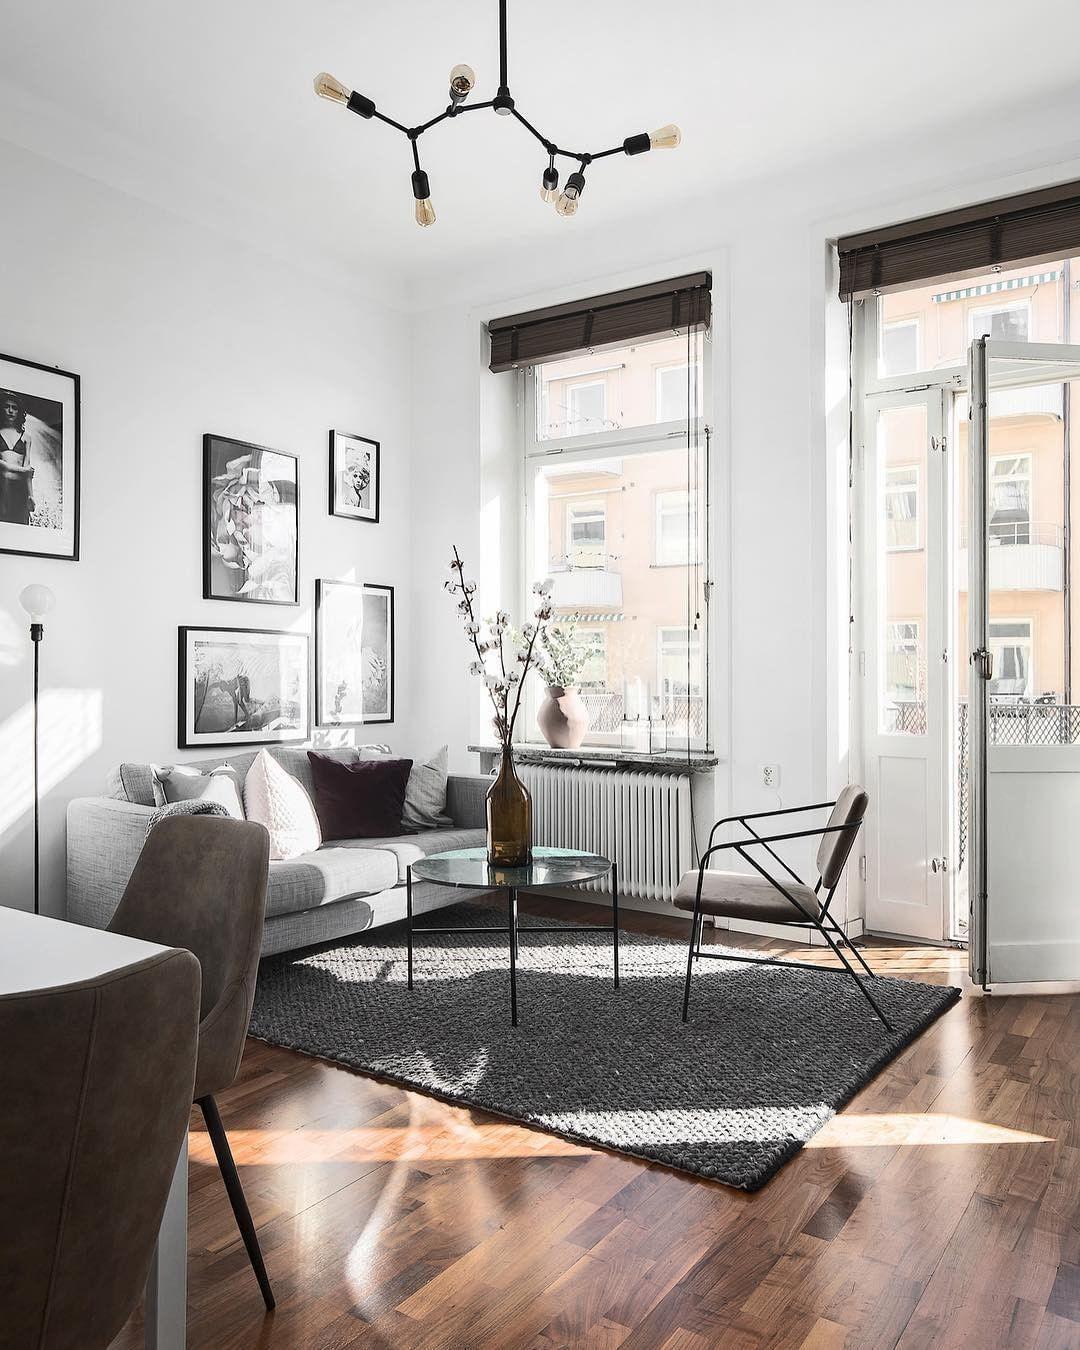 Minimalist Living Room Ideas Seeking To Improve And Also Fine Tune Your Hom Minimalist Living Room Design Minimalist Living Room Scandinavian Interior Design